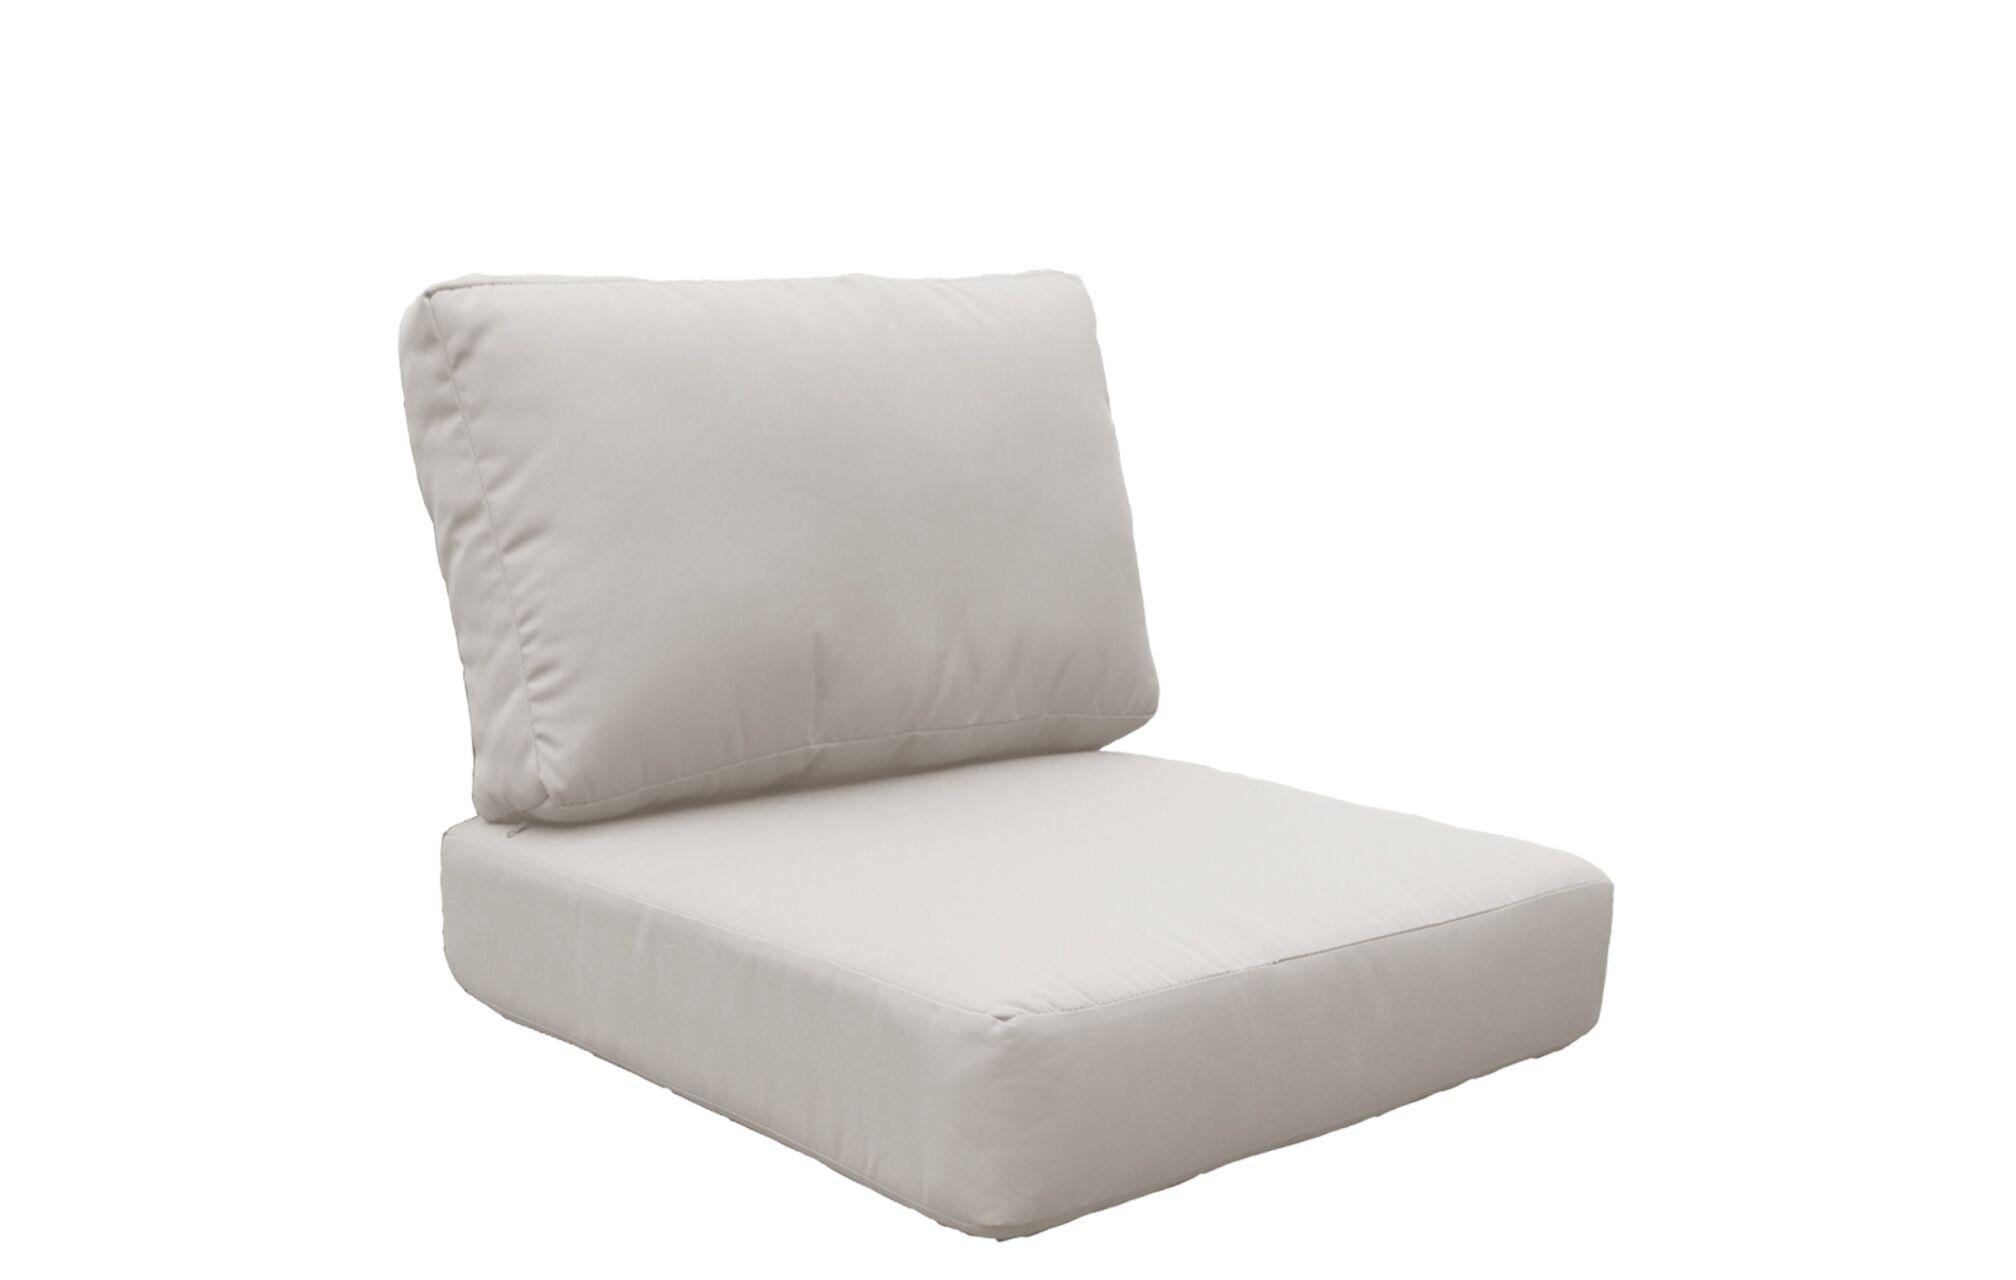 Coast 10 Piece Outdoor Lounge Chair Cushion Set Fabric: Beige